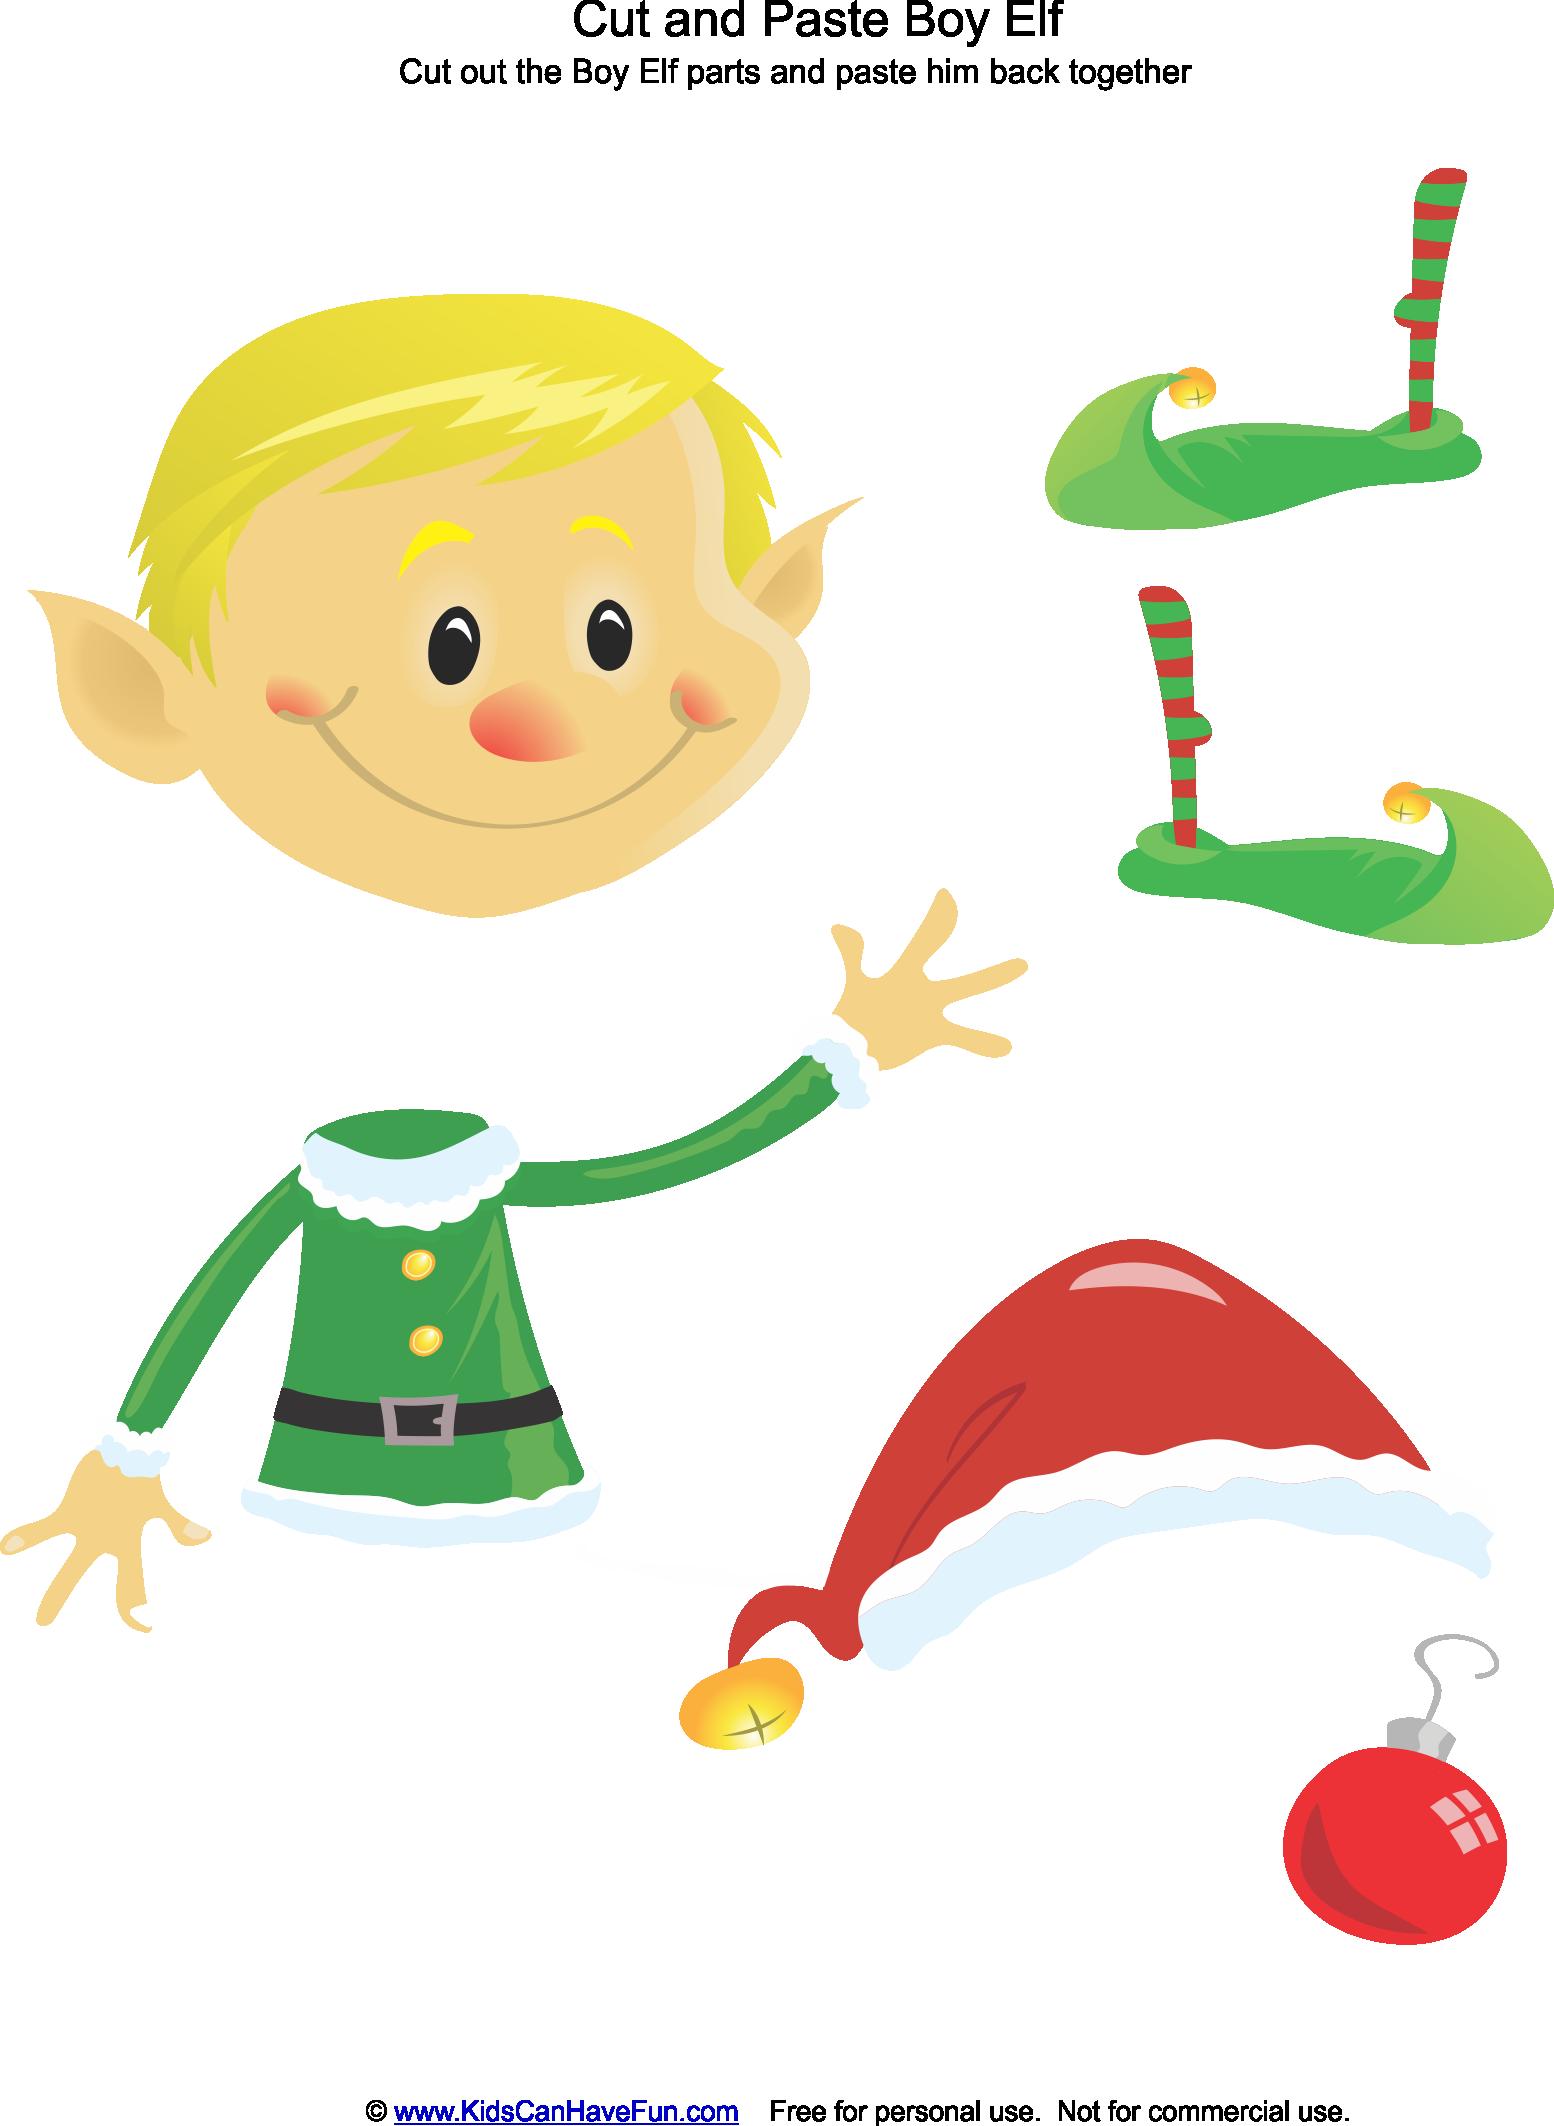 Cut And Paste Christmas Boy Elf Activity